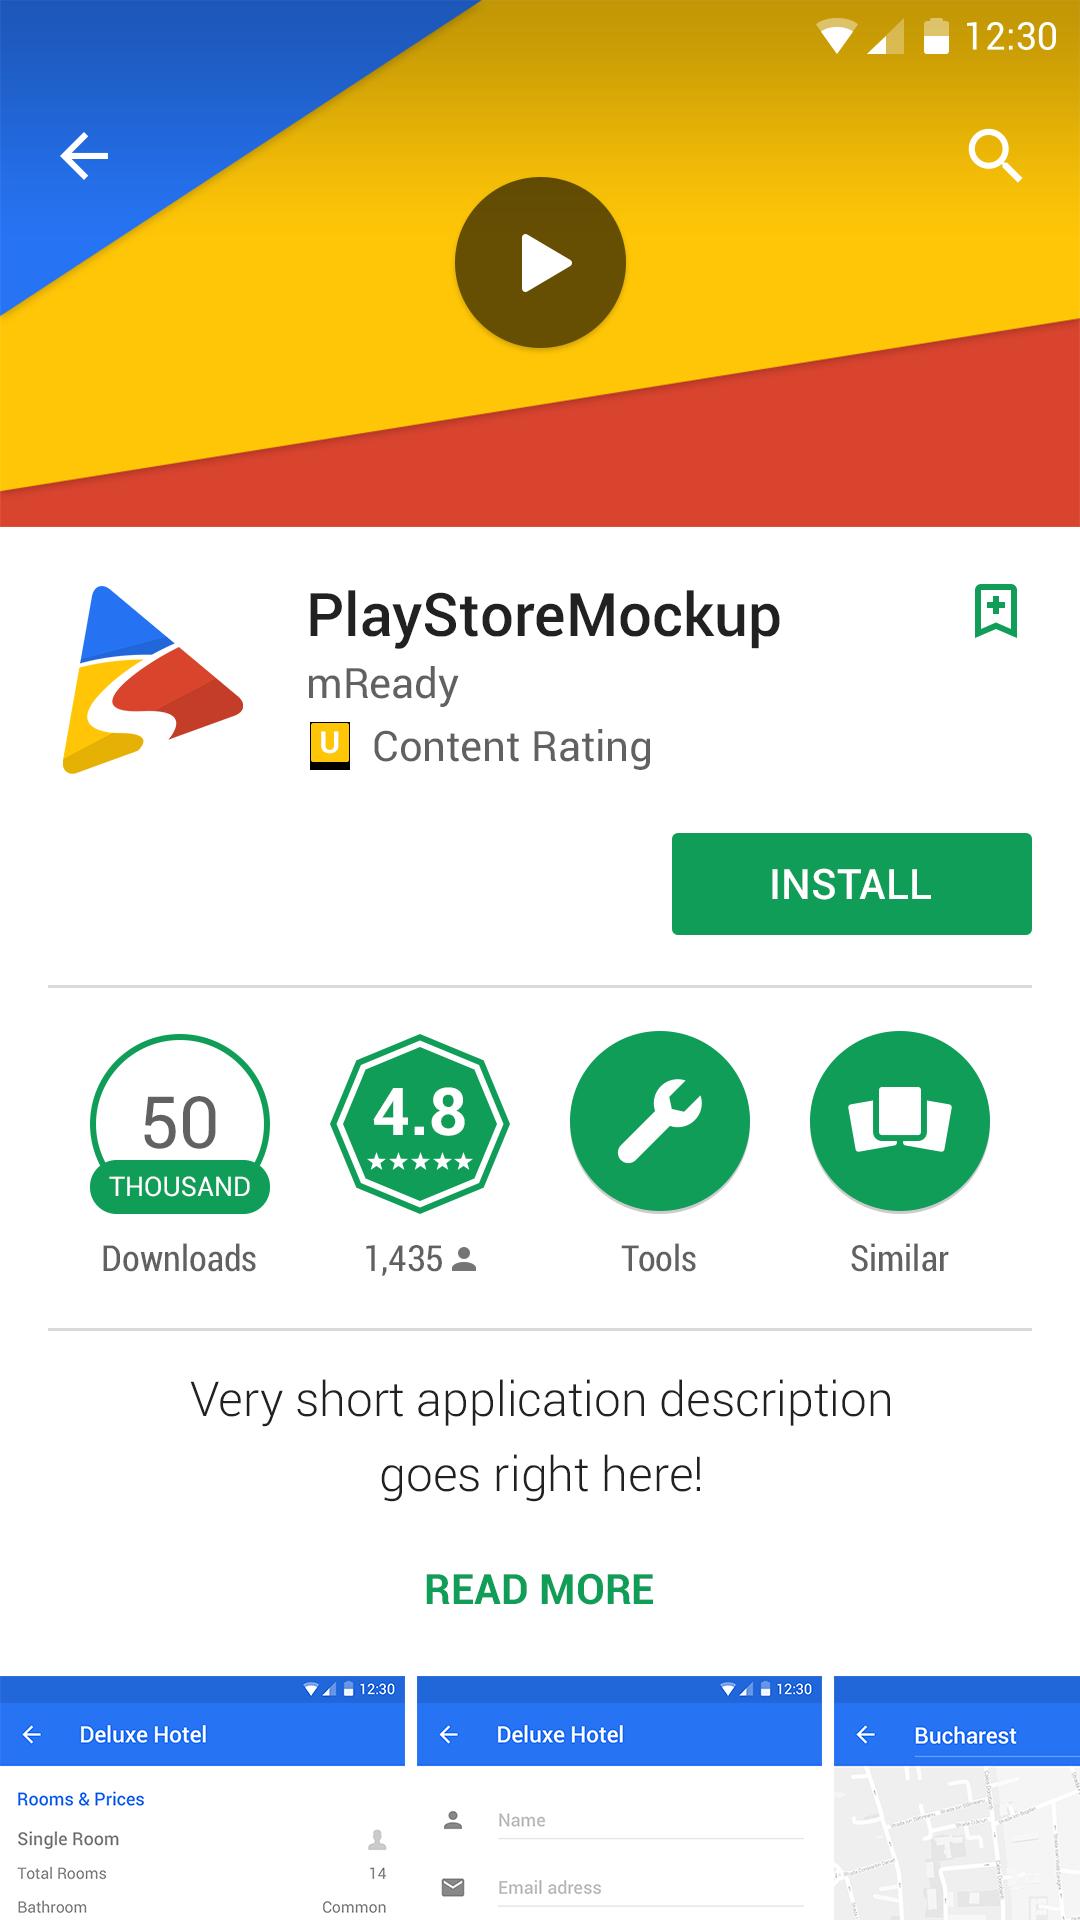 Play Store Mockup Application